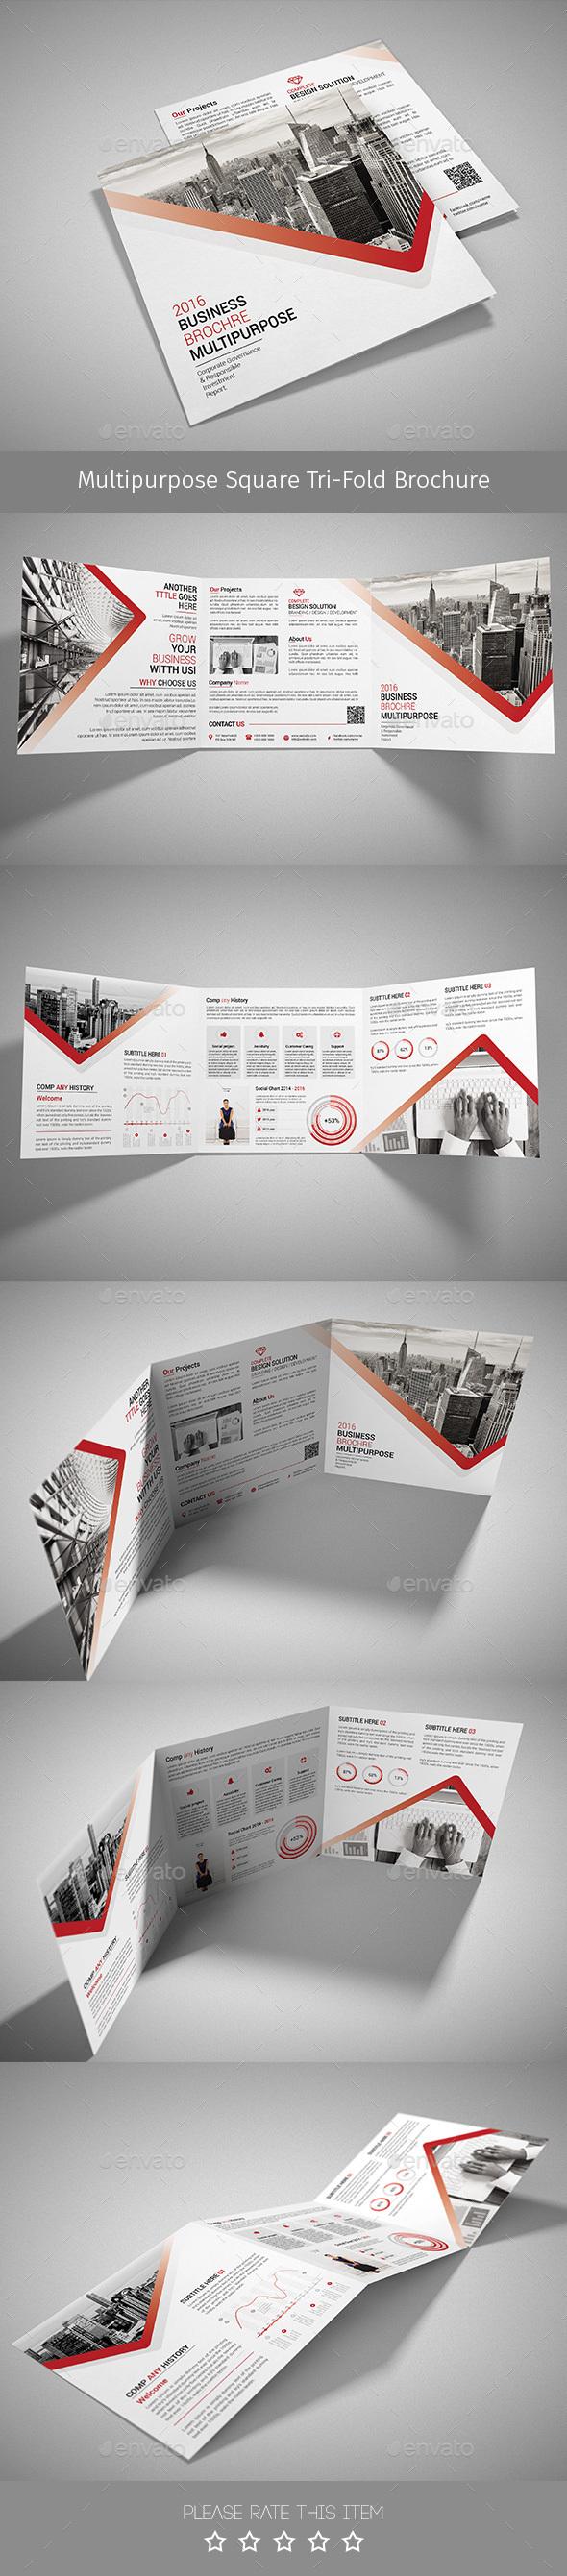 Corporate Tri-fold Square Brochure 07 - Corporate Brochures